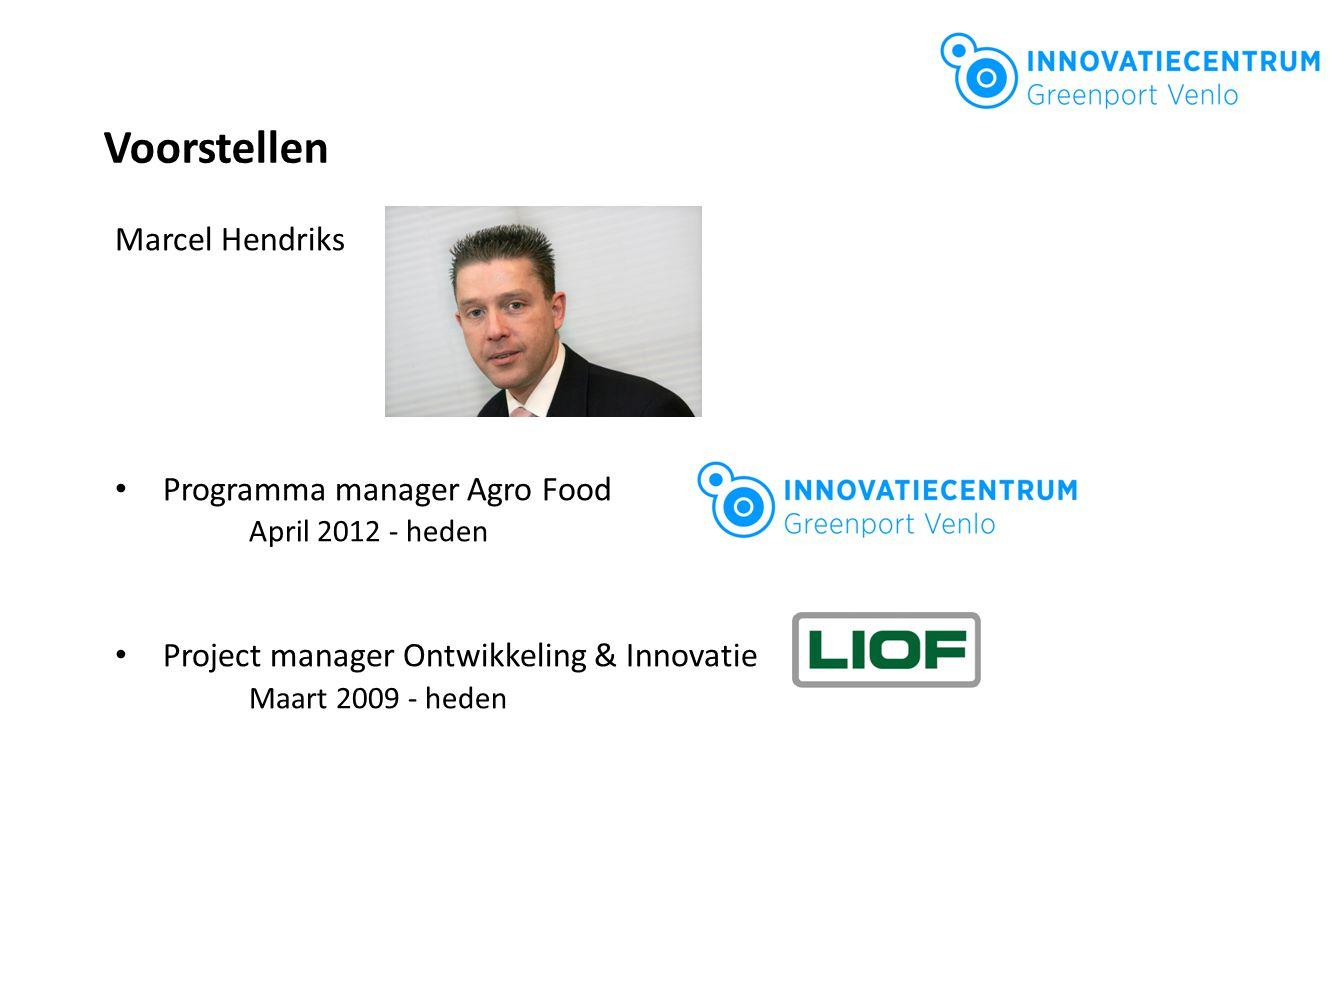 Voorstellen Marcel Hendriks Programma manager Agro Food April 2012 - heden Project manager Ontwikkeling & Innovatie Maart 2009 - heden